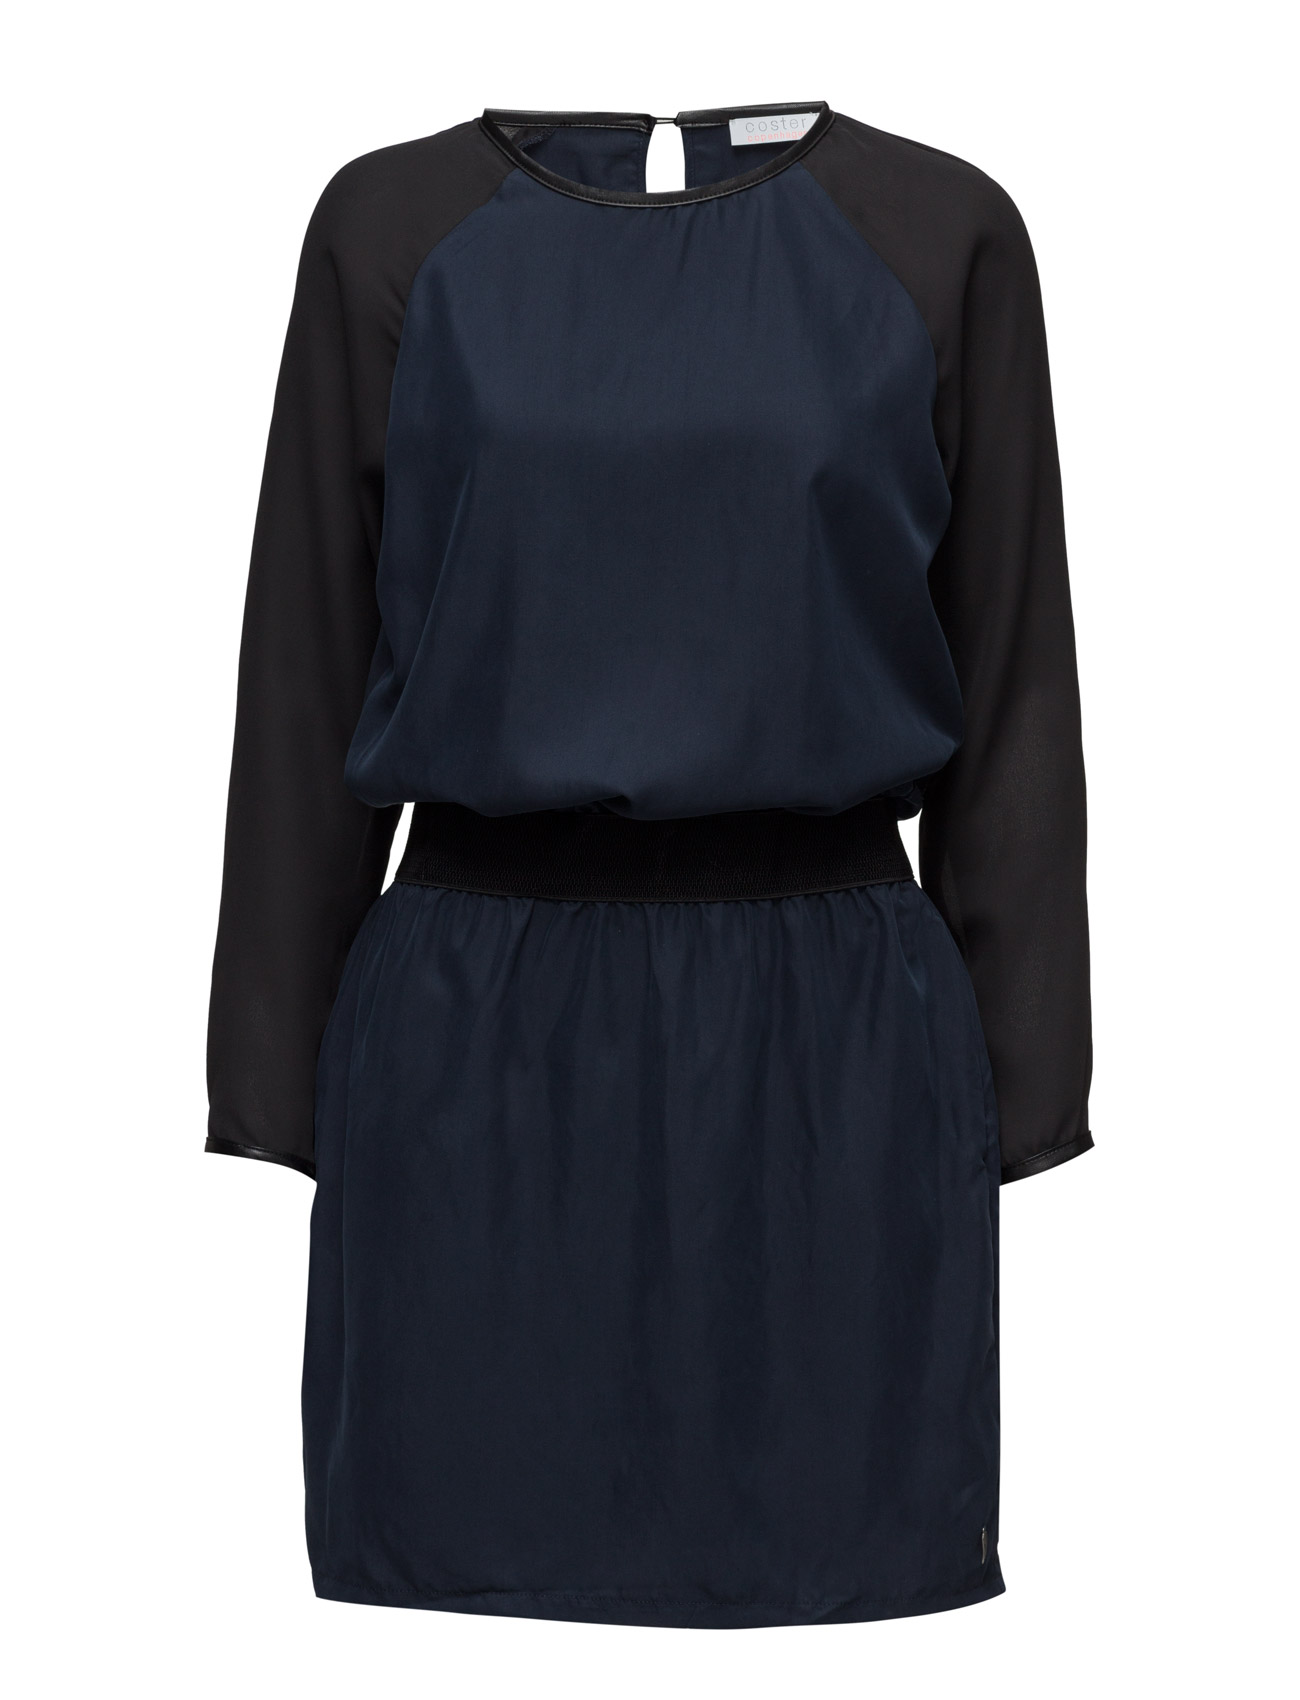 Coster Copenhagen Dress w. chiffon sleeve